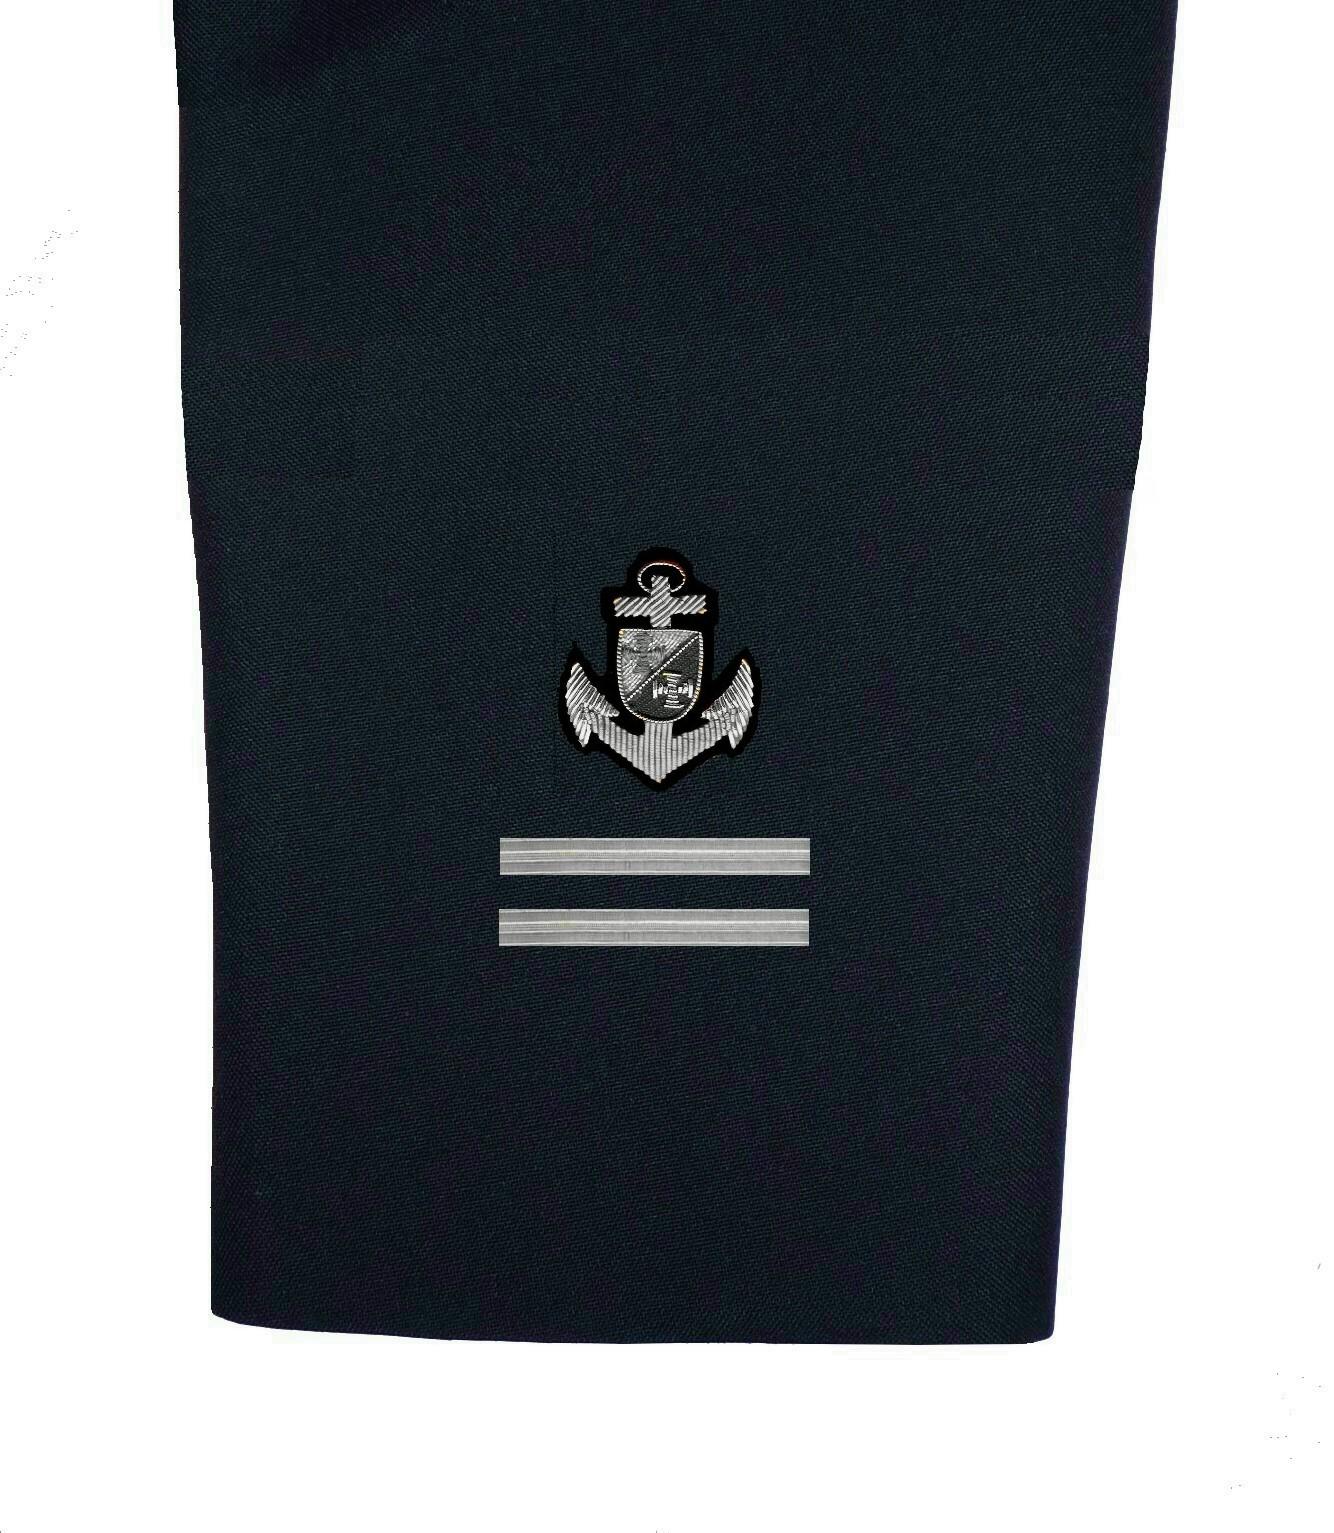 03-aermel-corporal